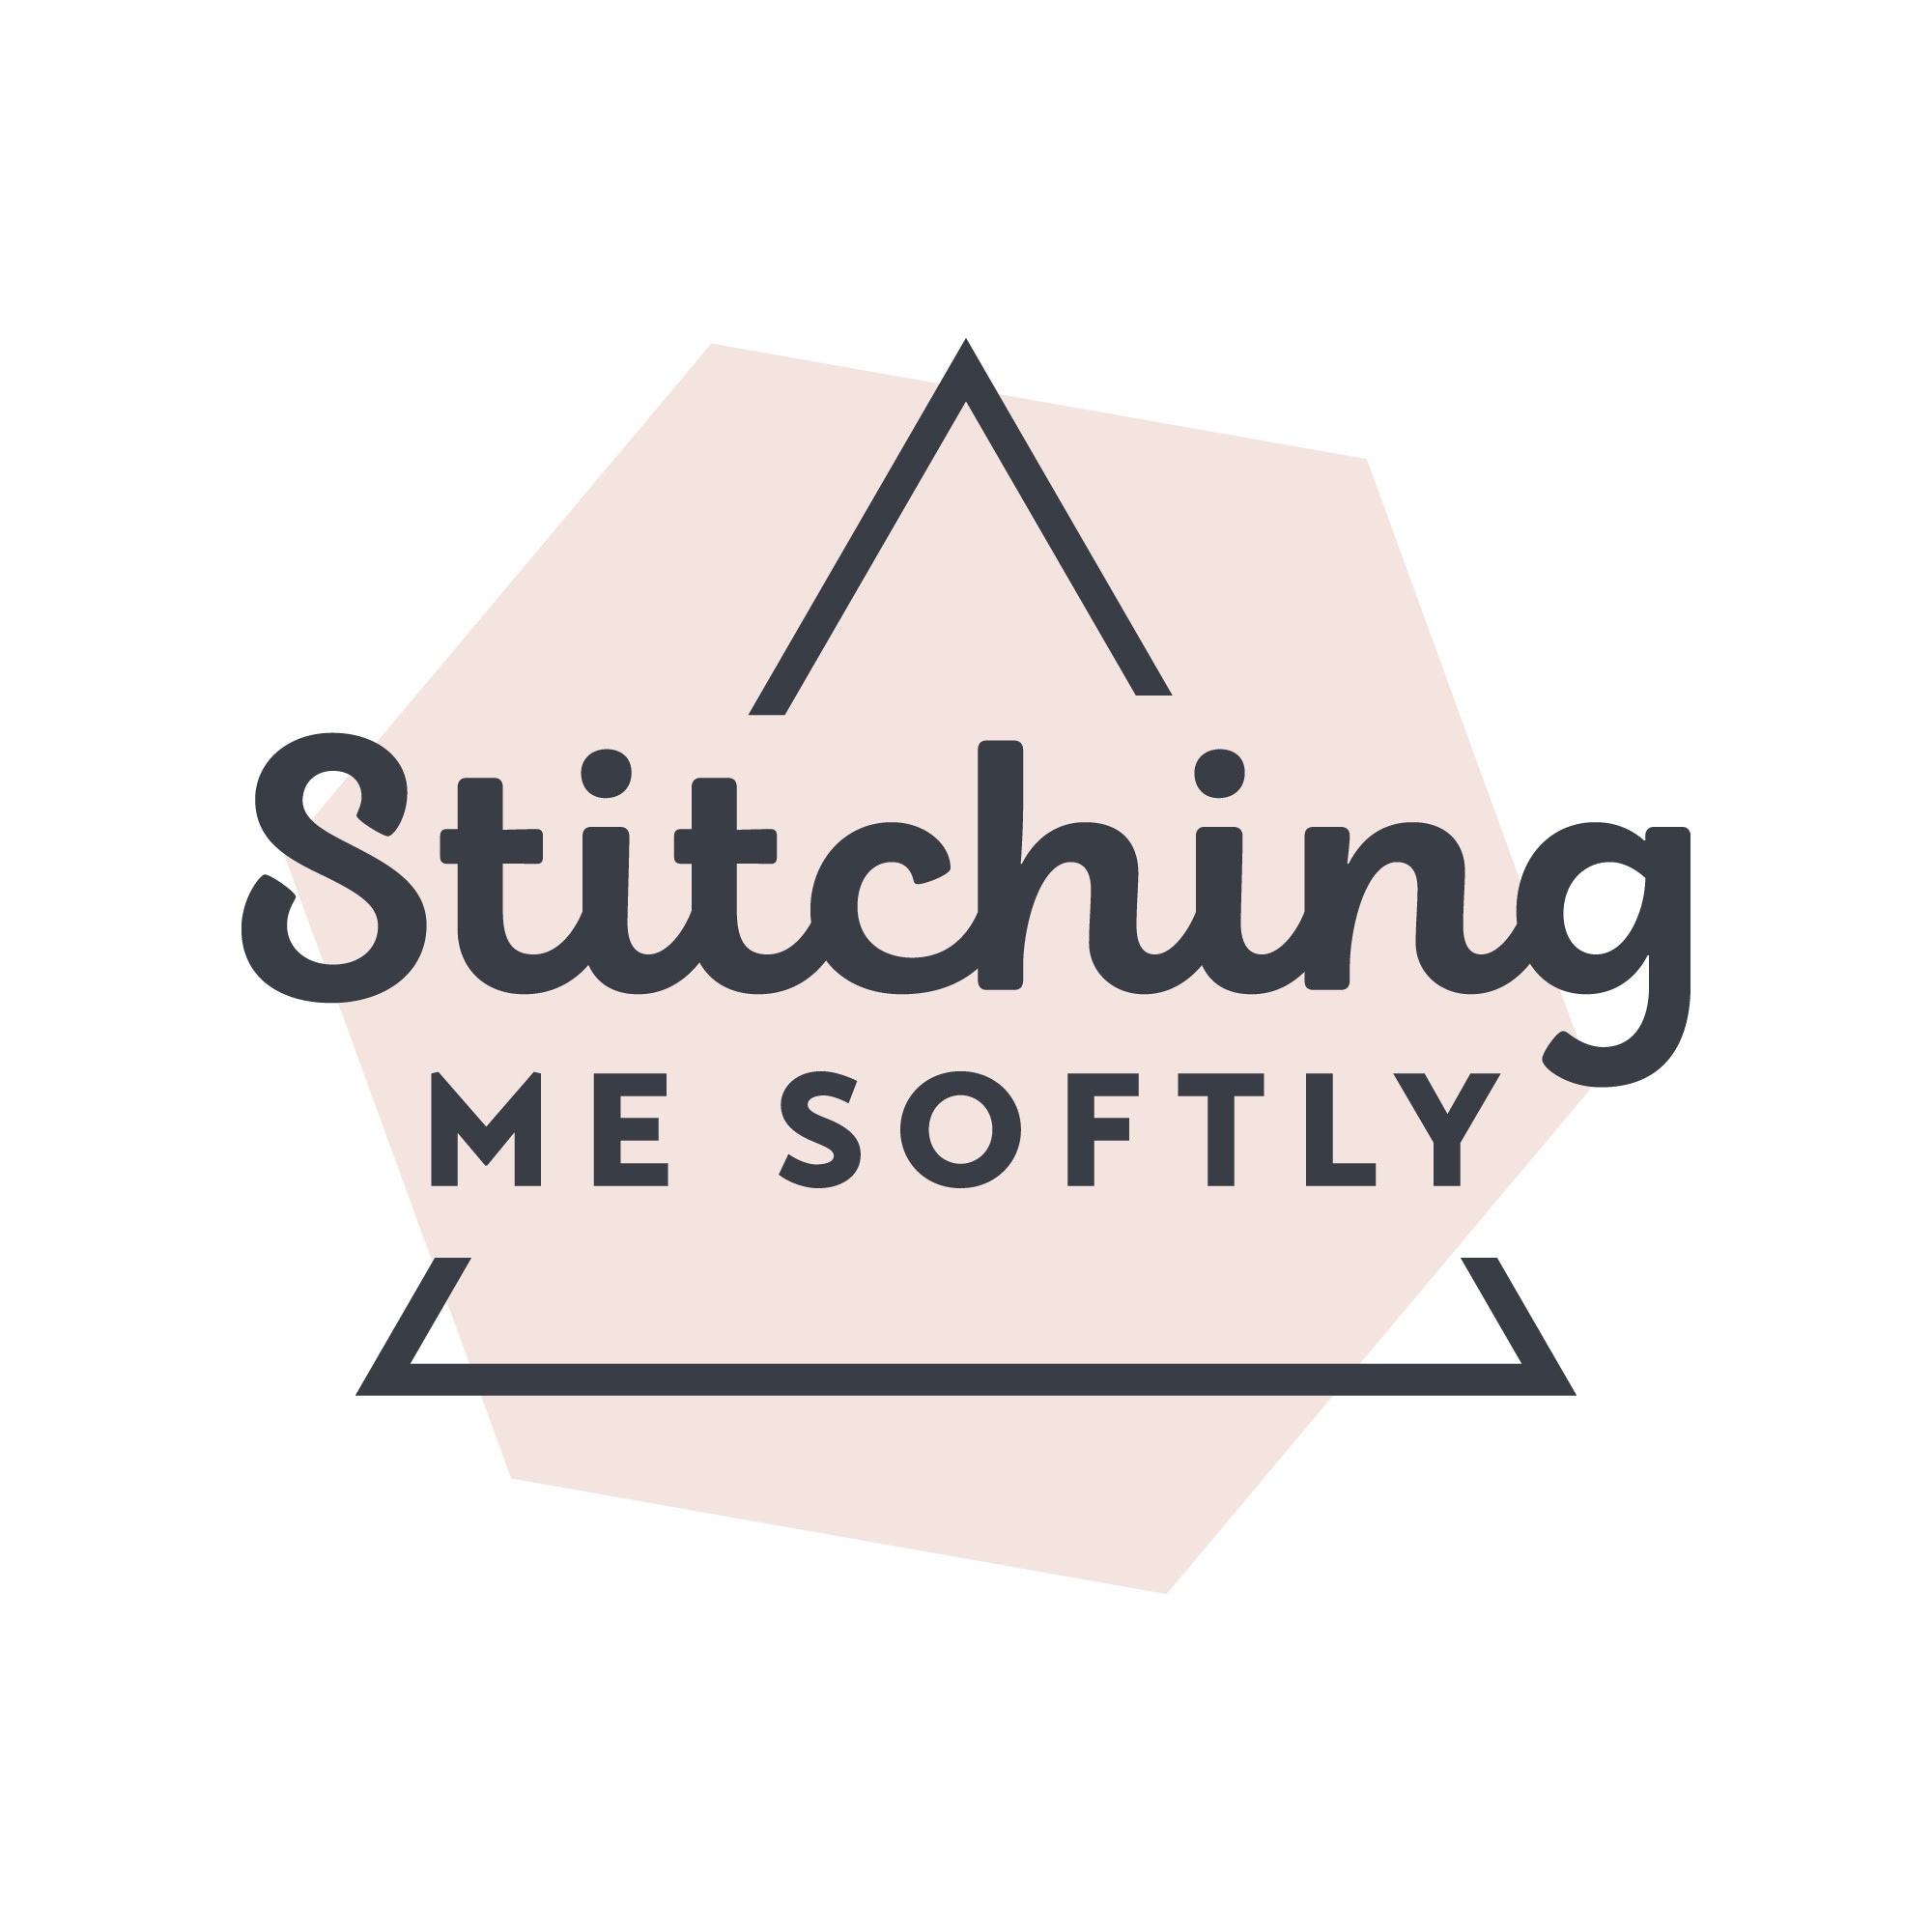 Stitching Me Softly